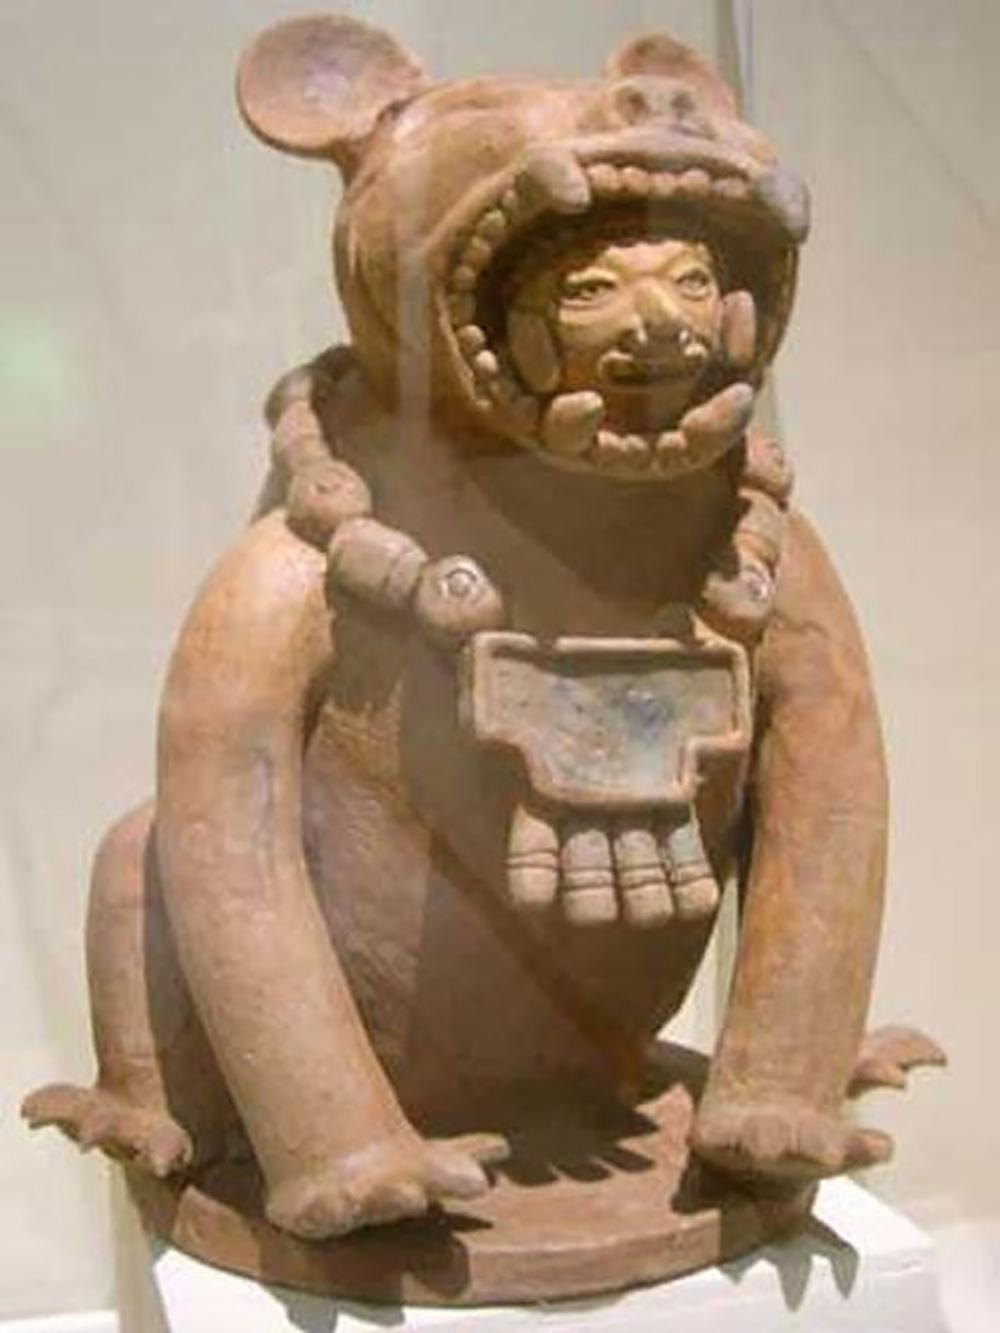 Jaguar warrior, from Cihuatan, the largest Mayan site in El Salvador.